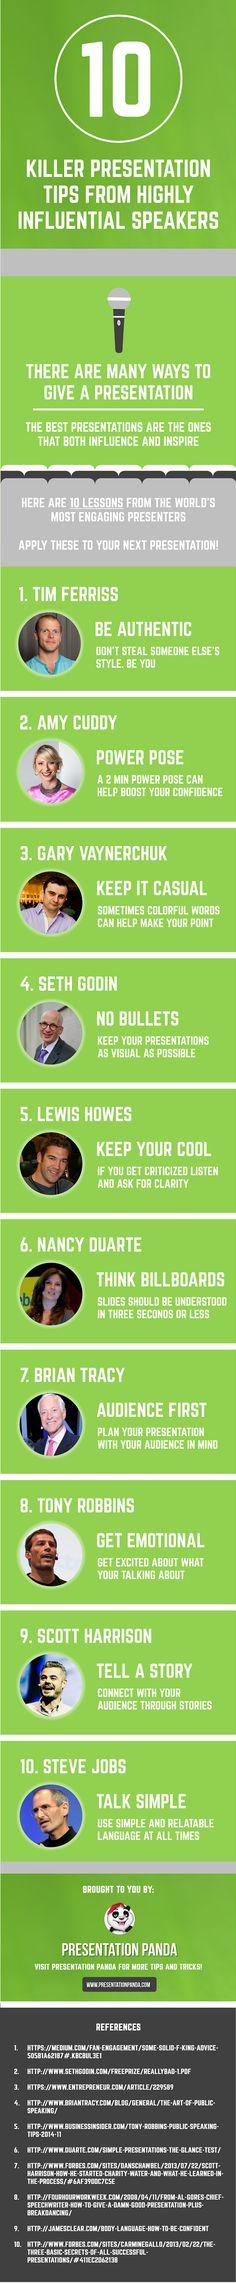 10 Killer PresentationTips From Highly Influential People (Nancy Duarte, Tim Ferriss, Gary Vaynerchuk, Tony Robbins, Amy Cuddy, Lewis Howes, Seth Godin, Steve Jobs, Brian Tracy, Scott Harrison)